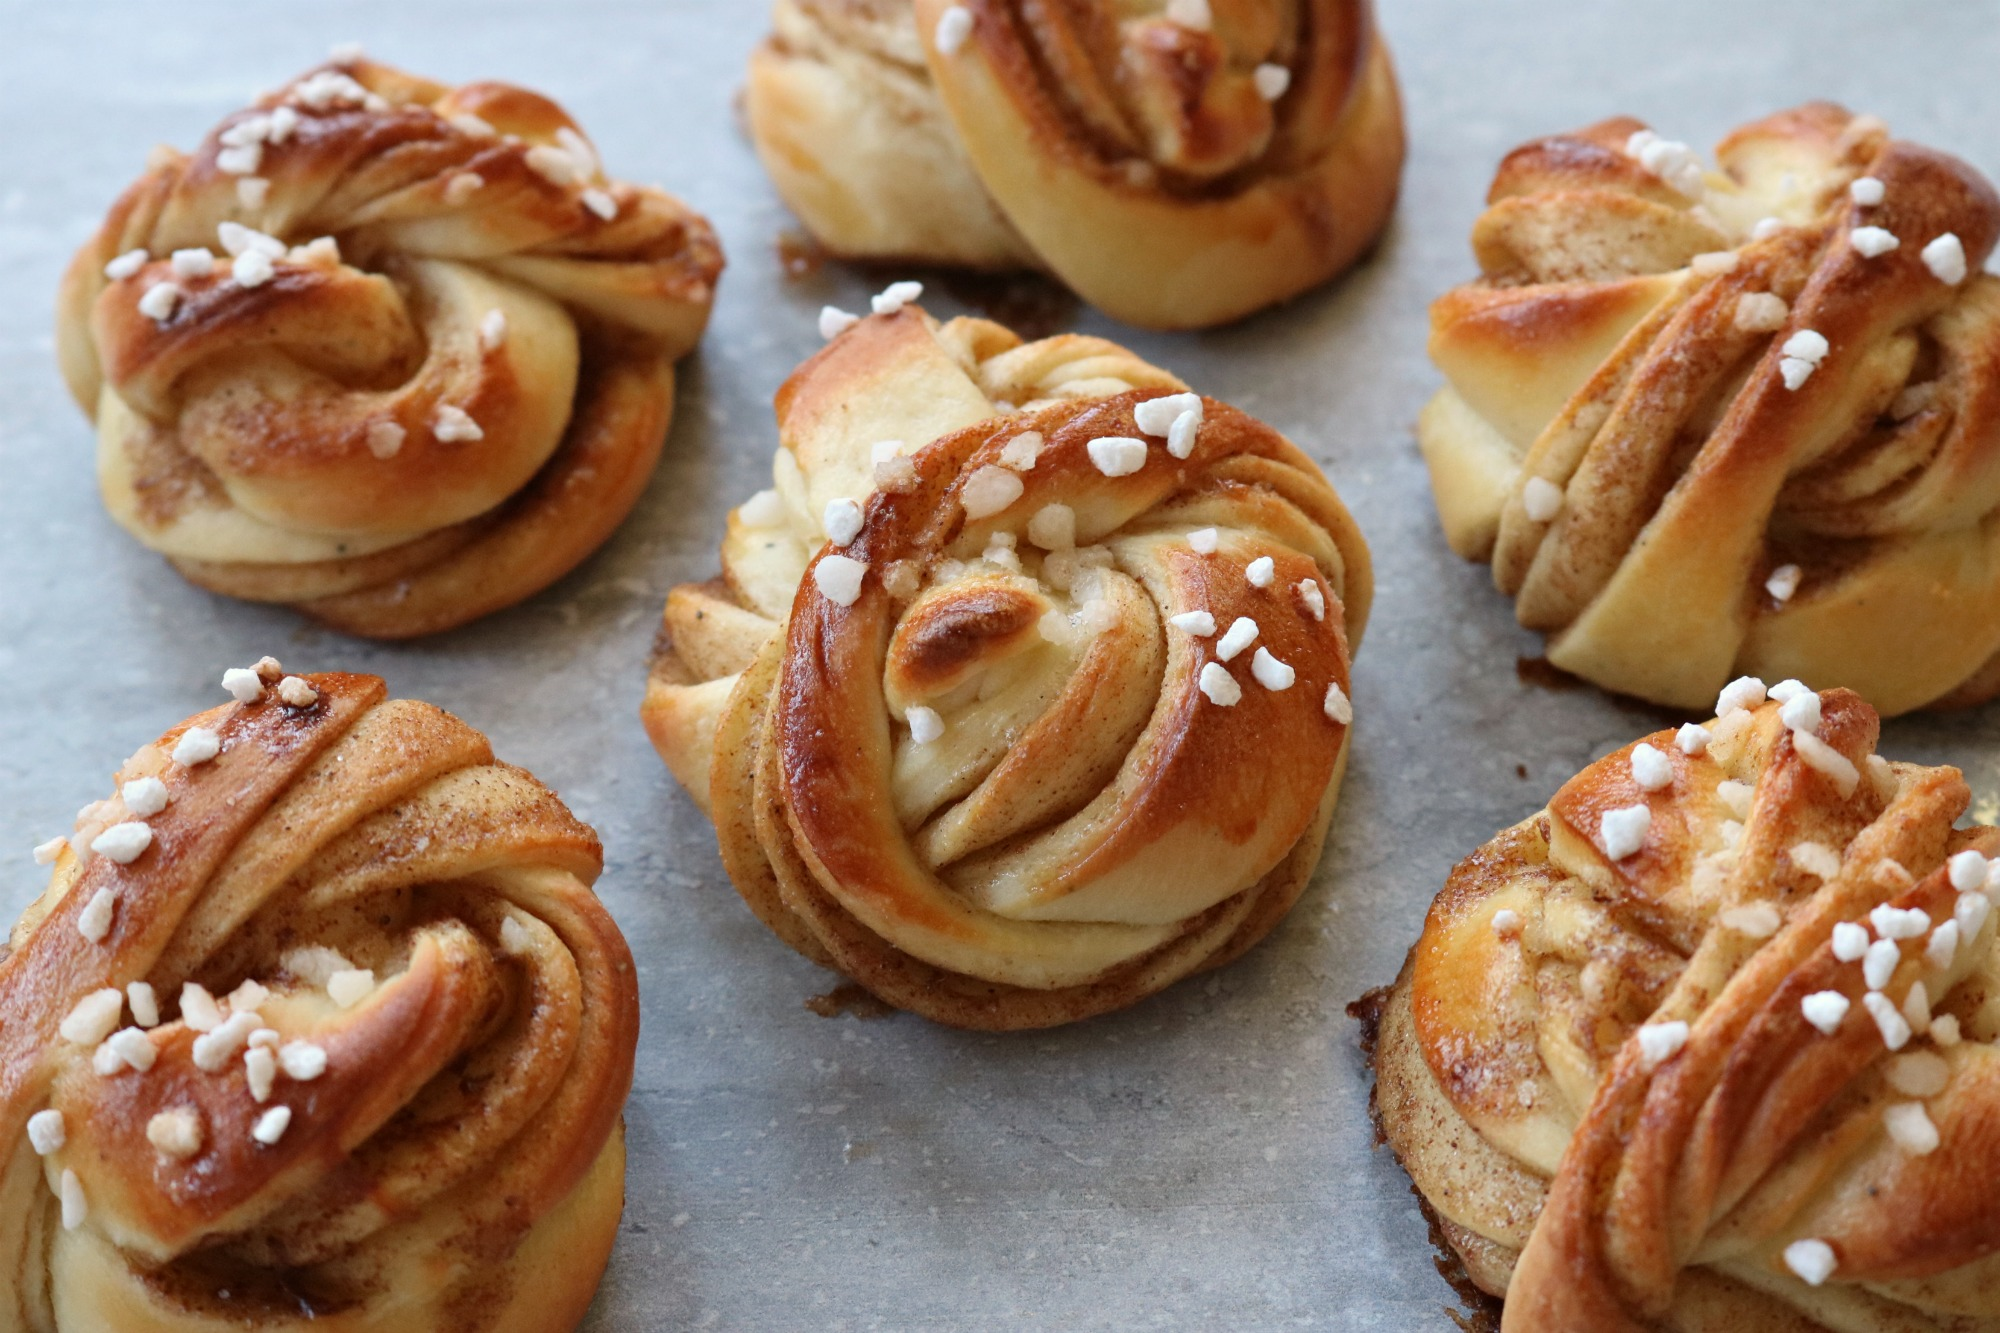 Kanelbullar - Scandanavian cinnamon buns